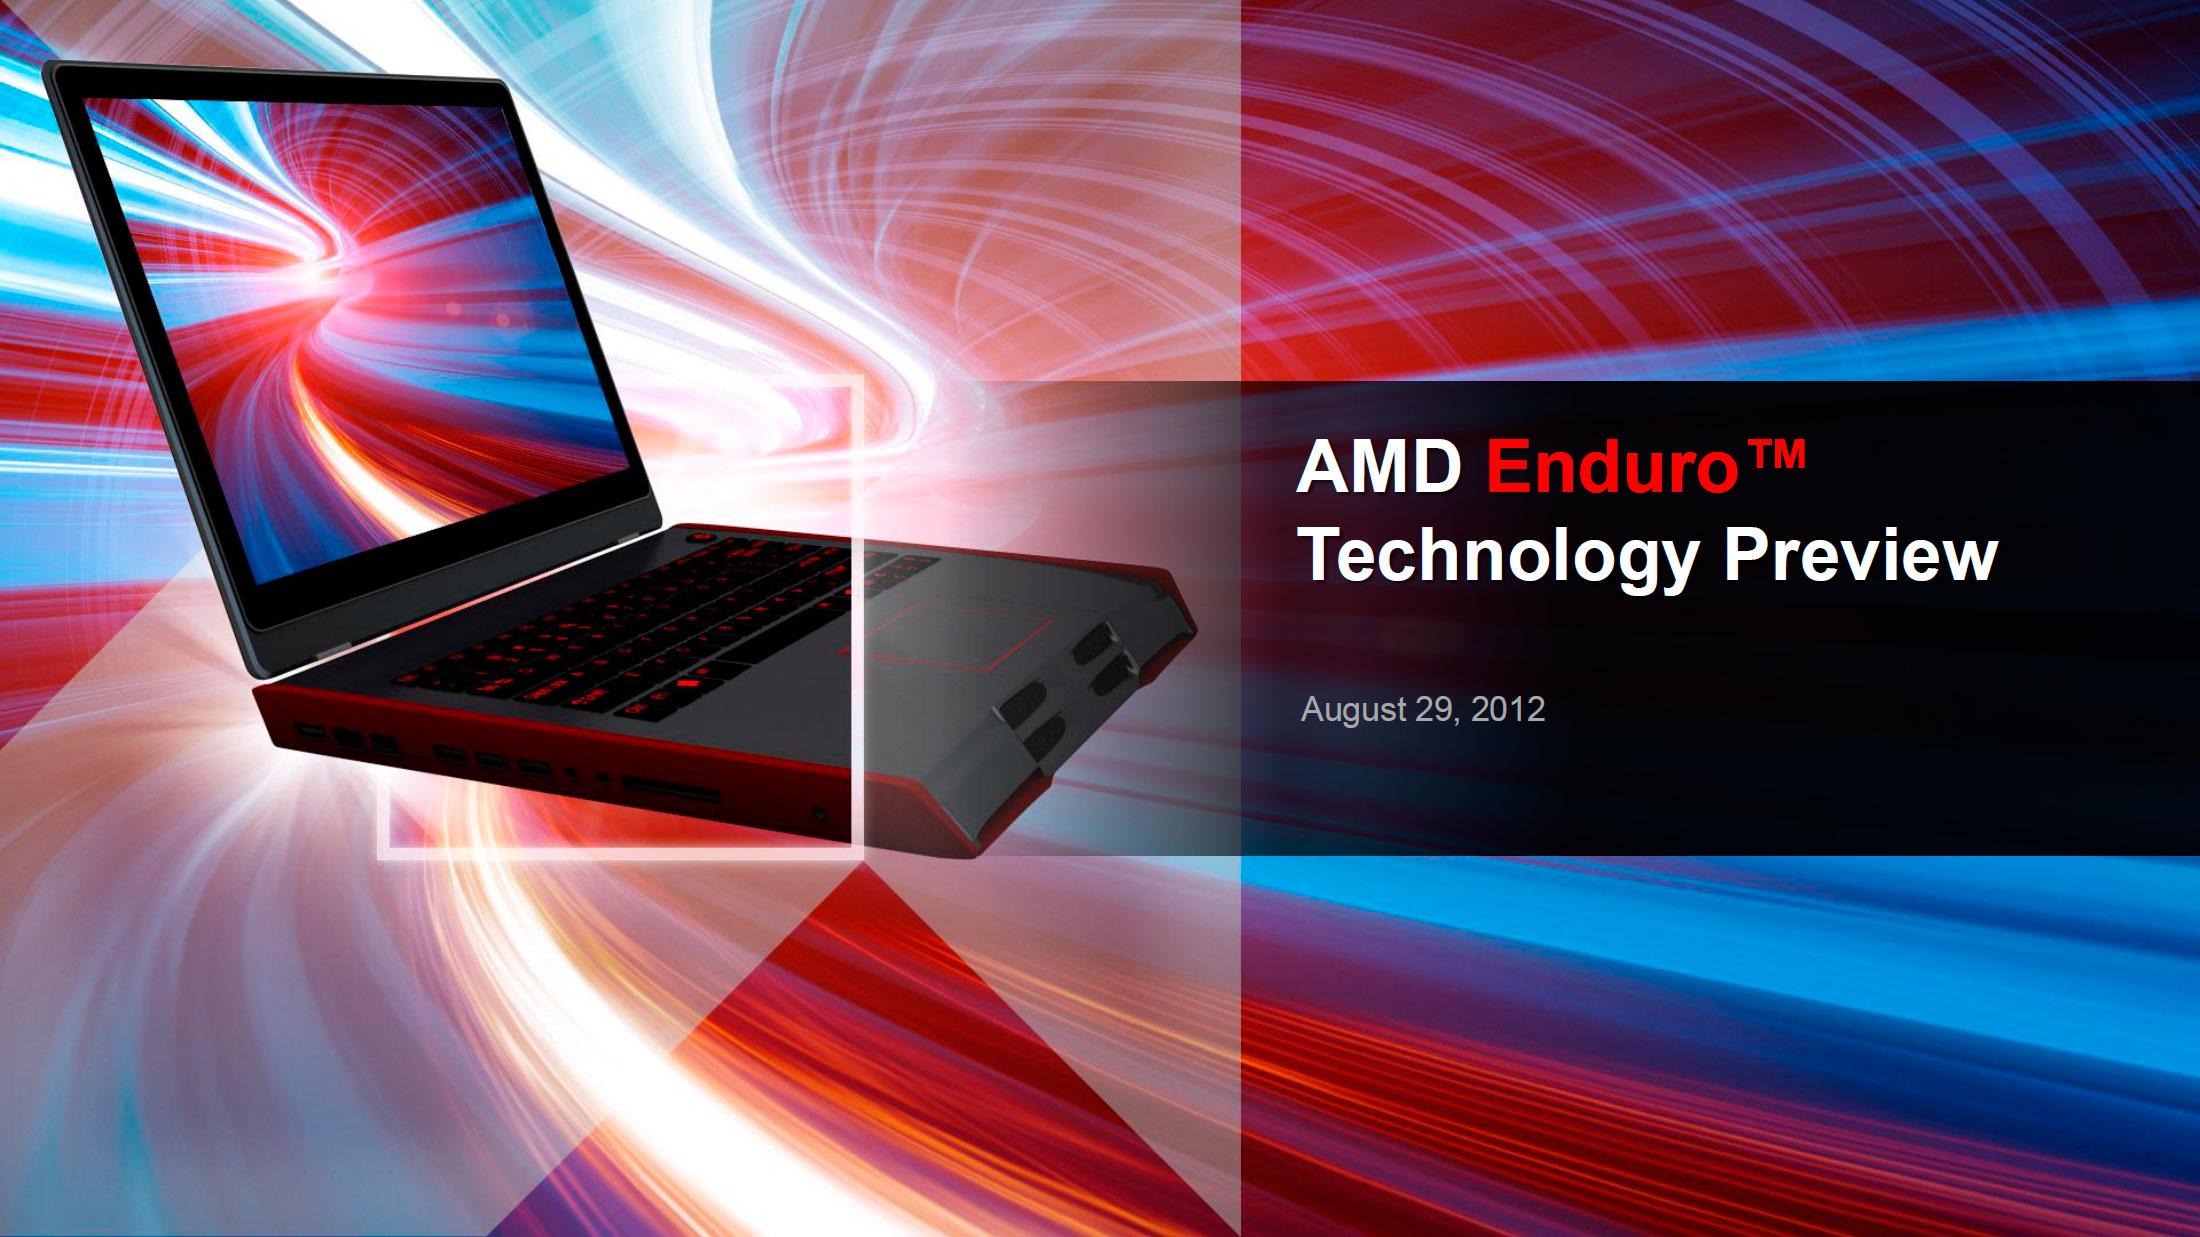 Amd Radeon 7970m Drivers